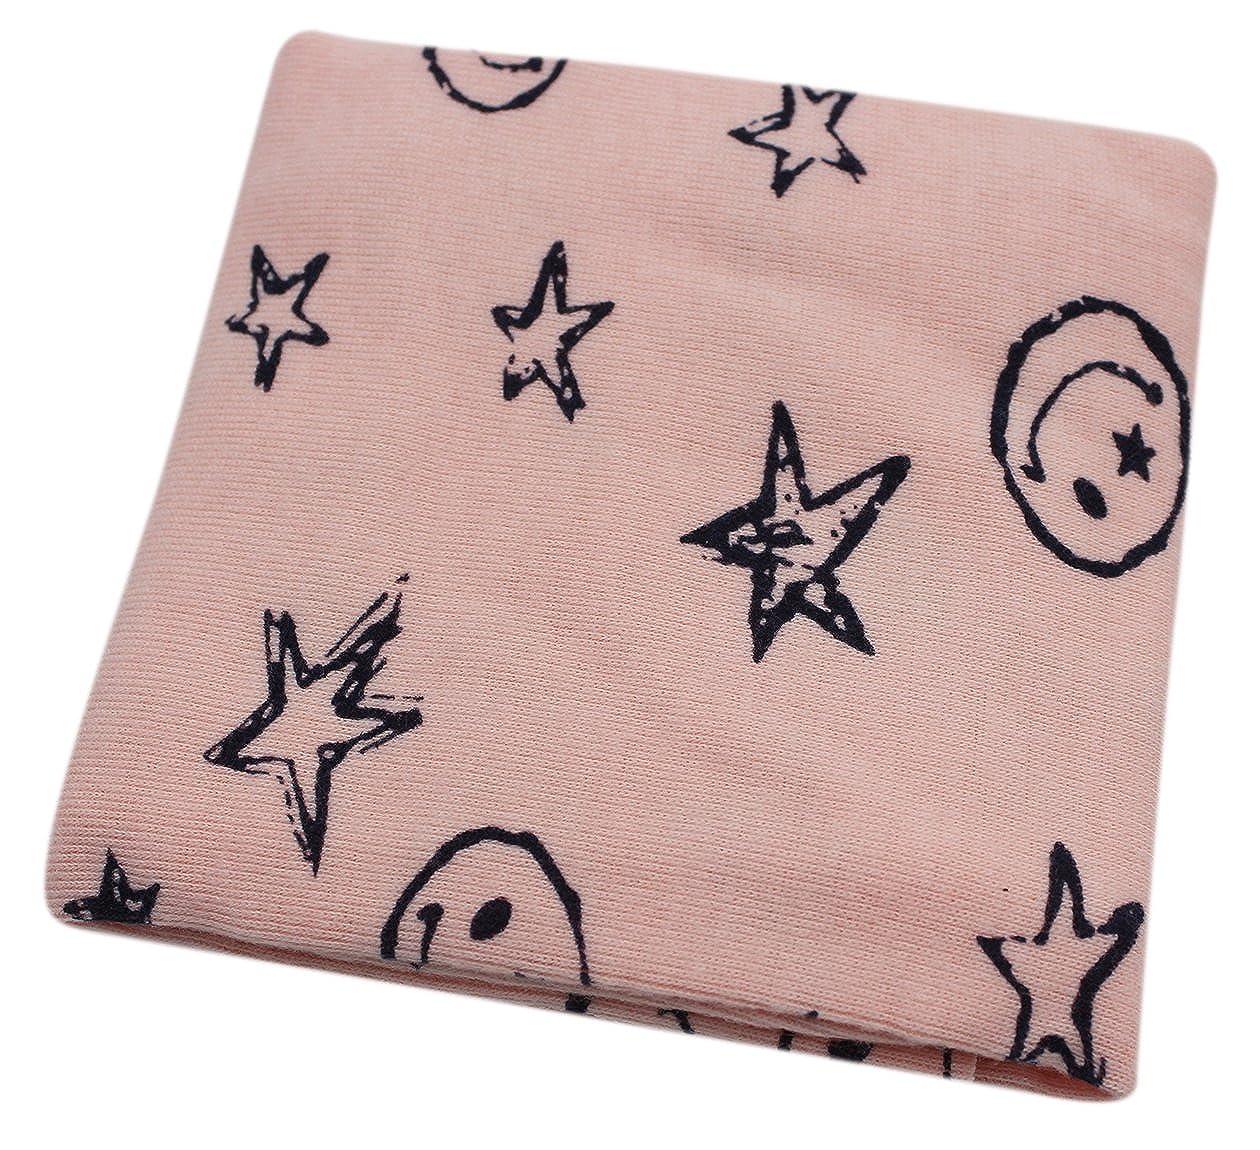 Aibearty Kids Winter Warm Cotton Infinity Scarf Cute Star Print Neck Warmer